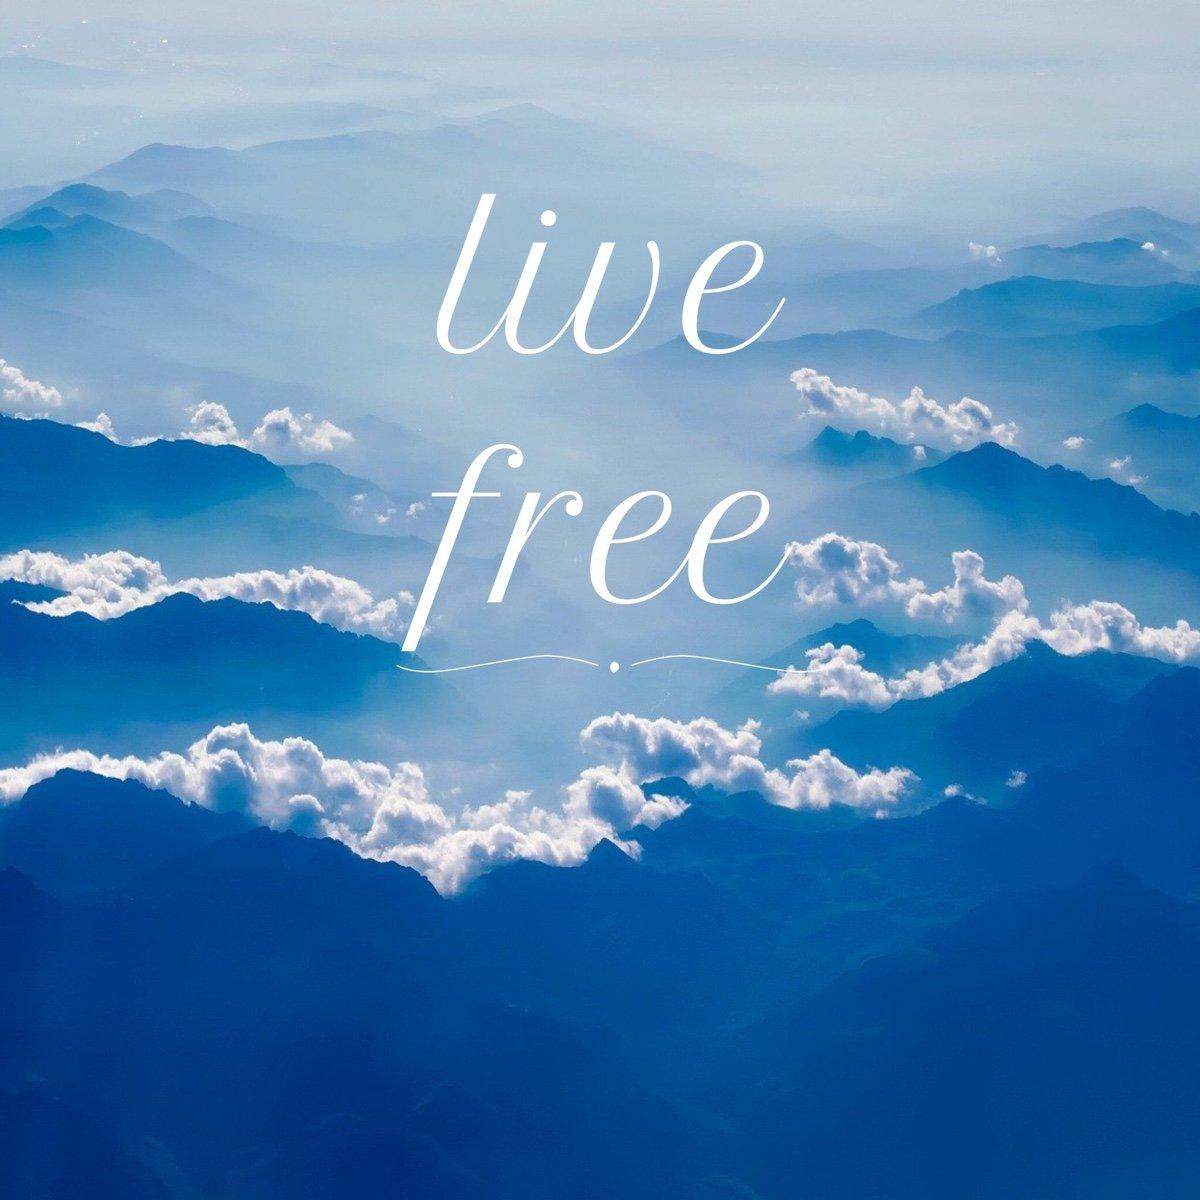 live free image quote